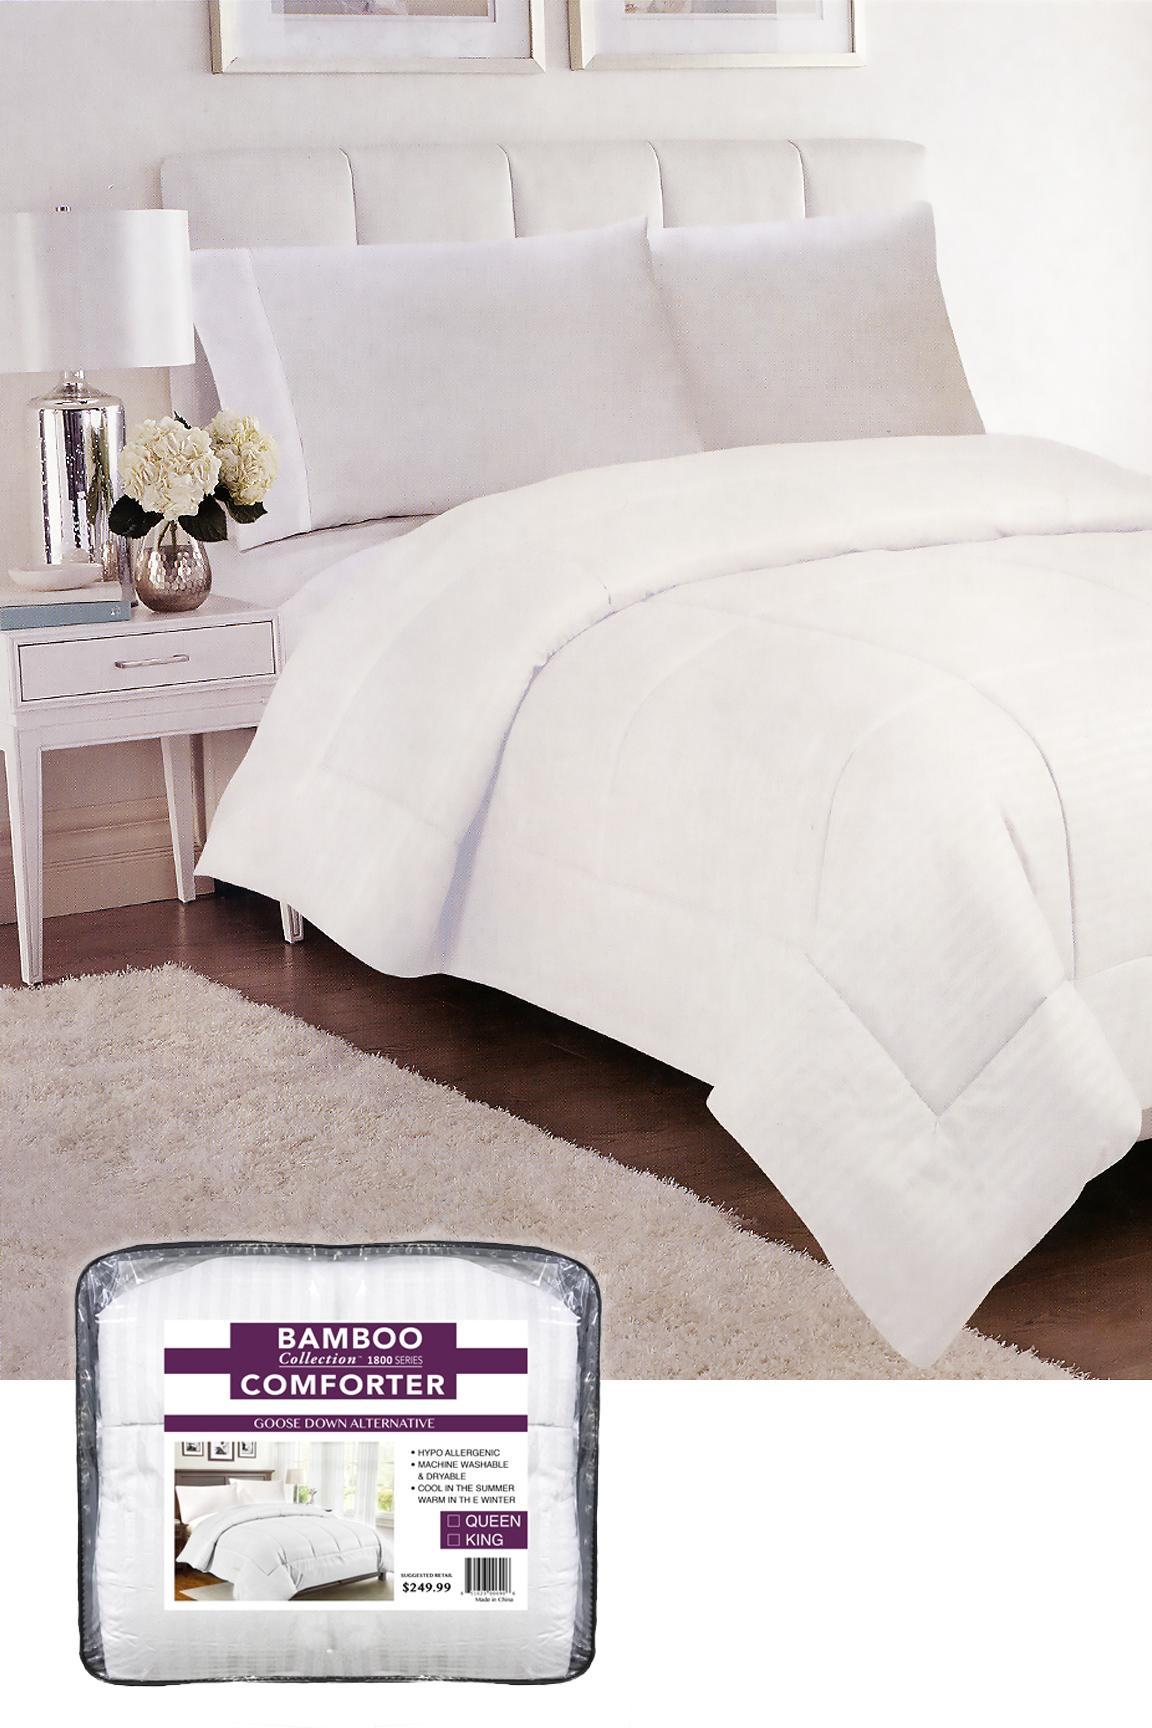 Down Alternative Bamboo Comforter